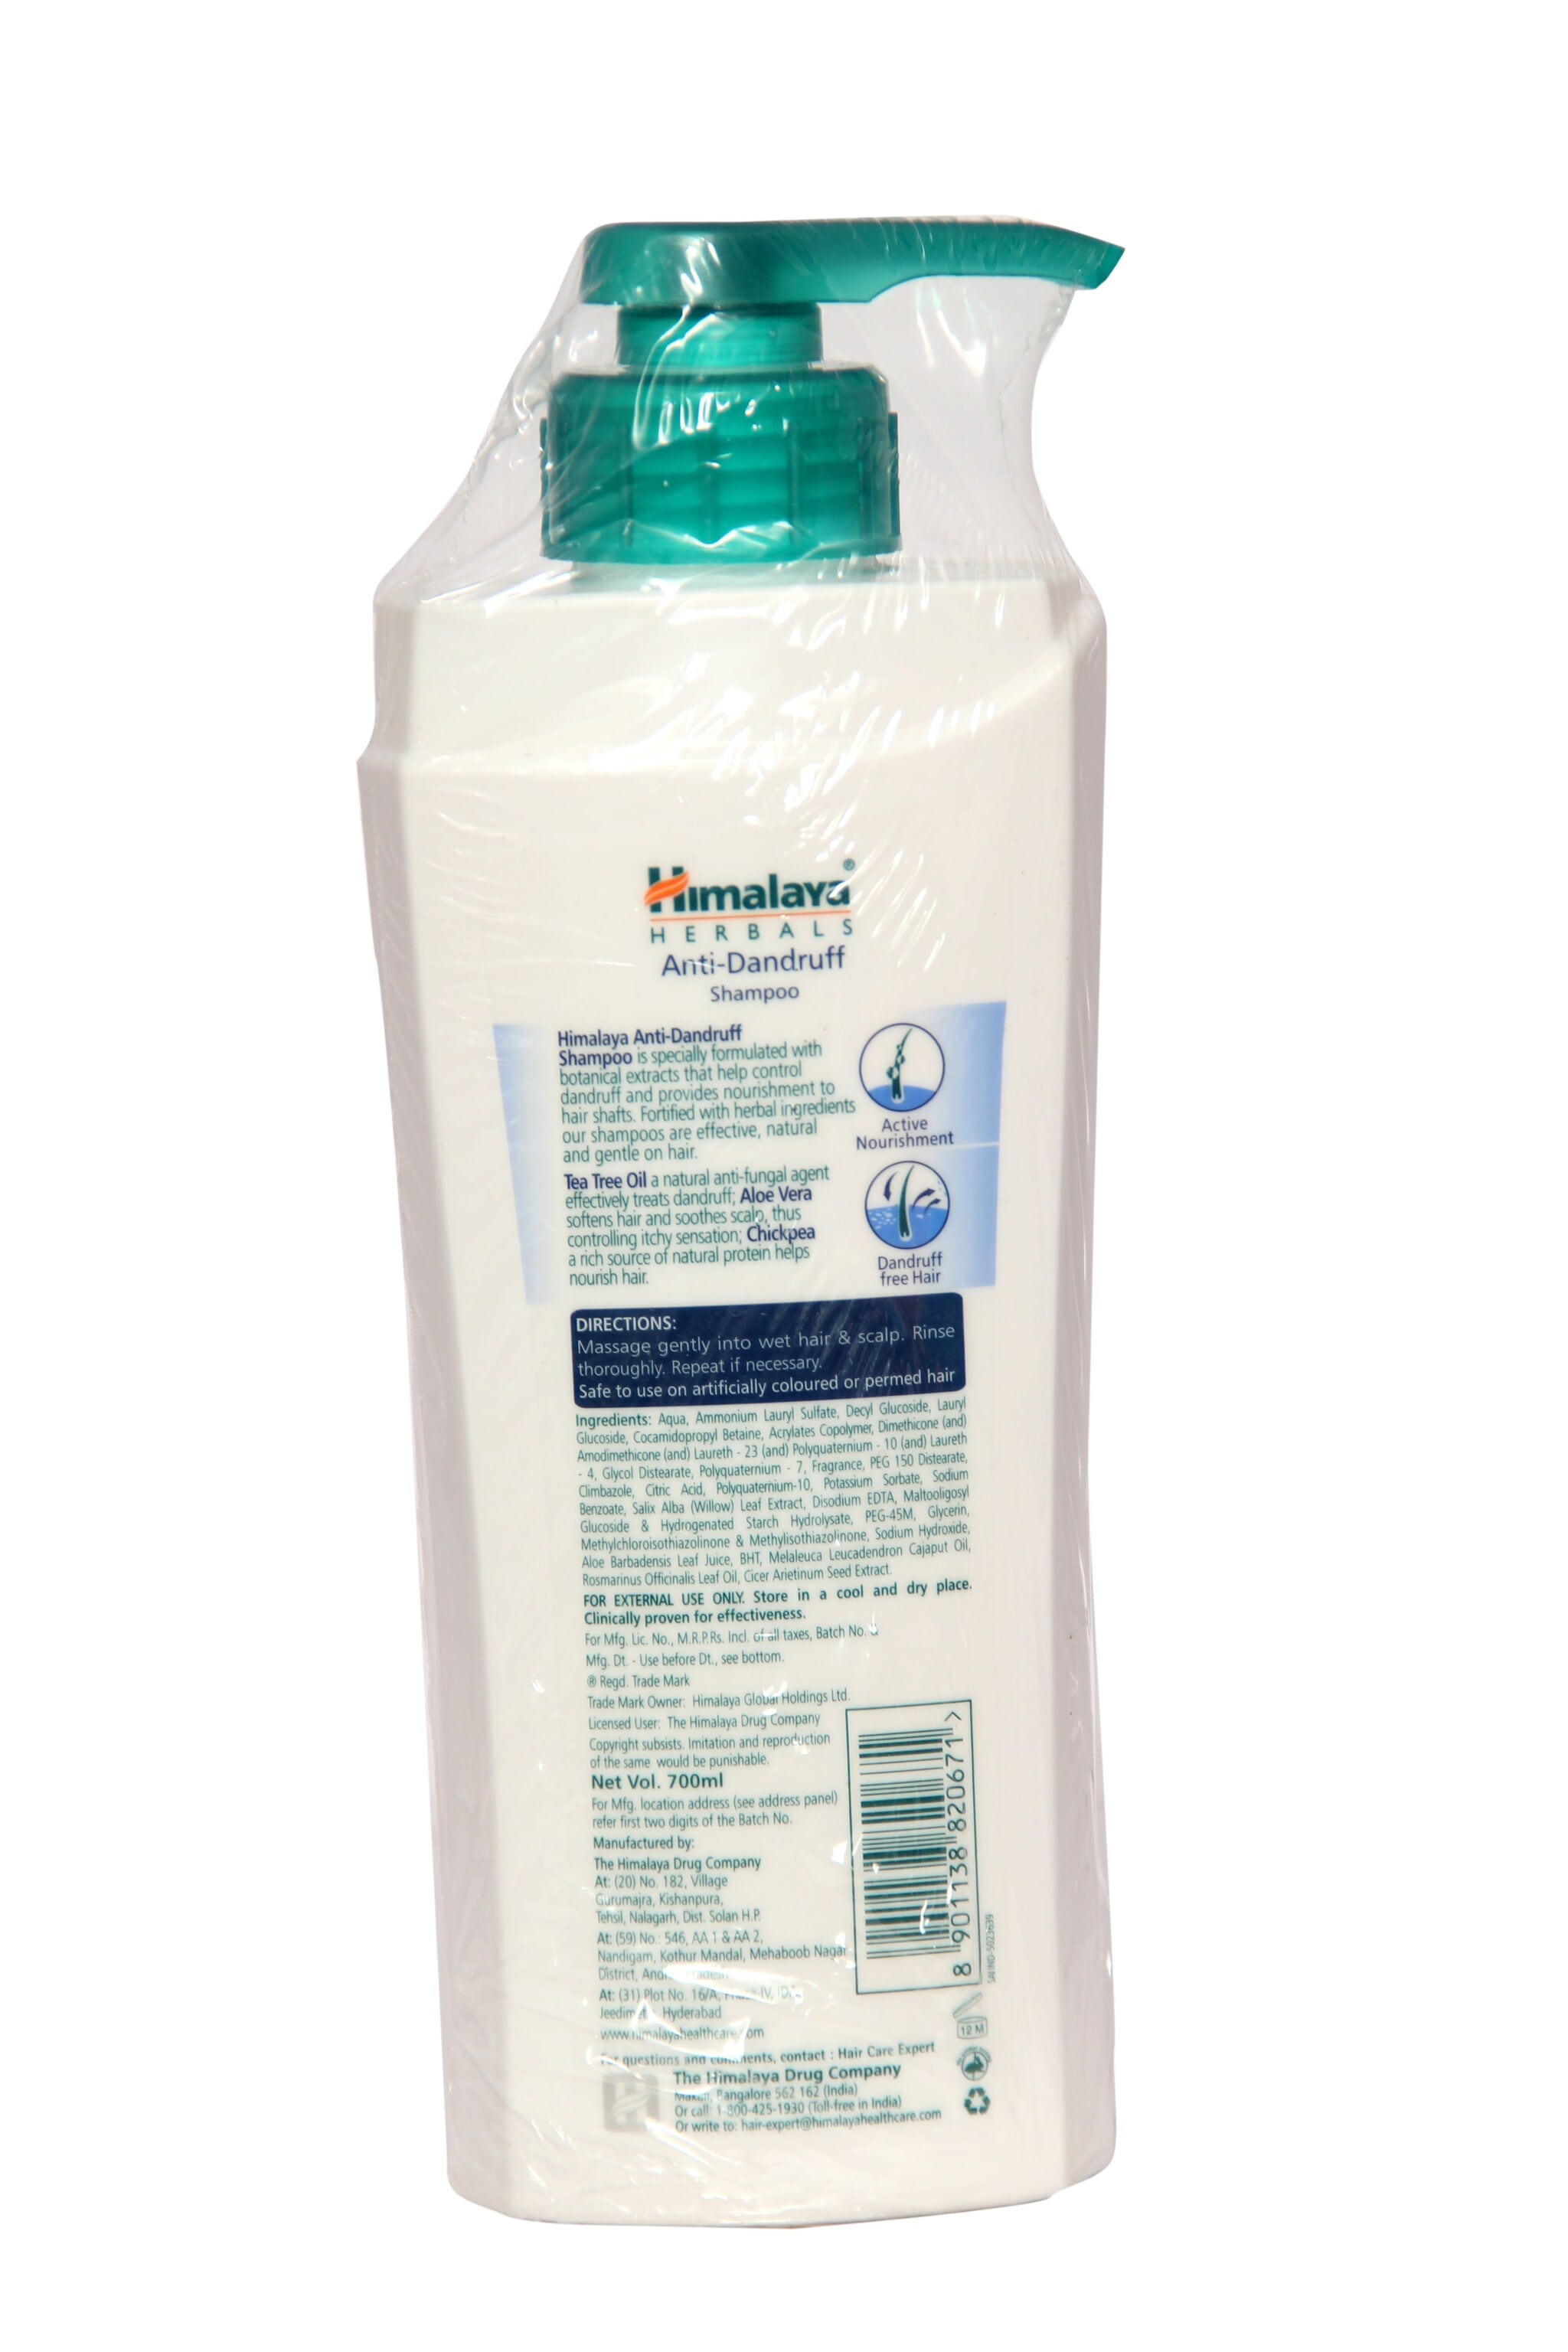 Himalaya Herbals Anti-Dandruff Shampoo